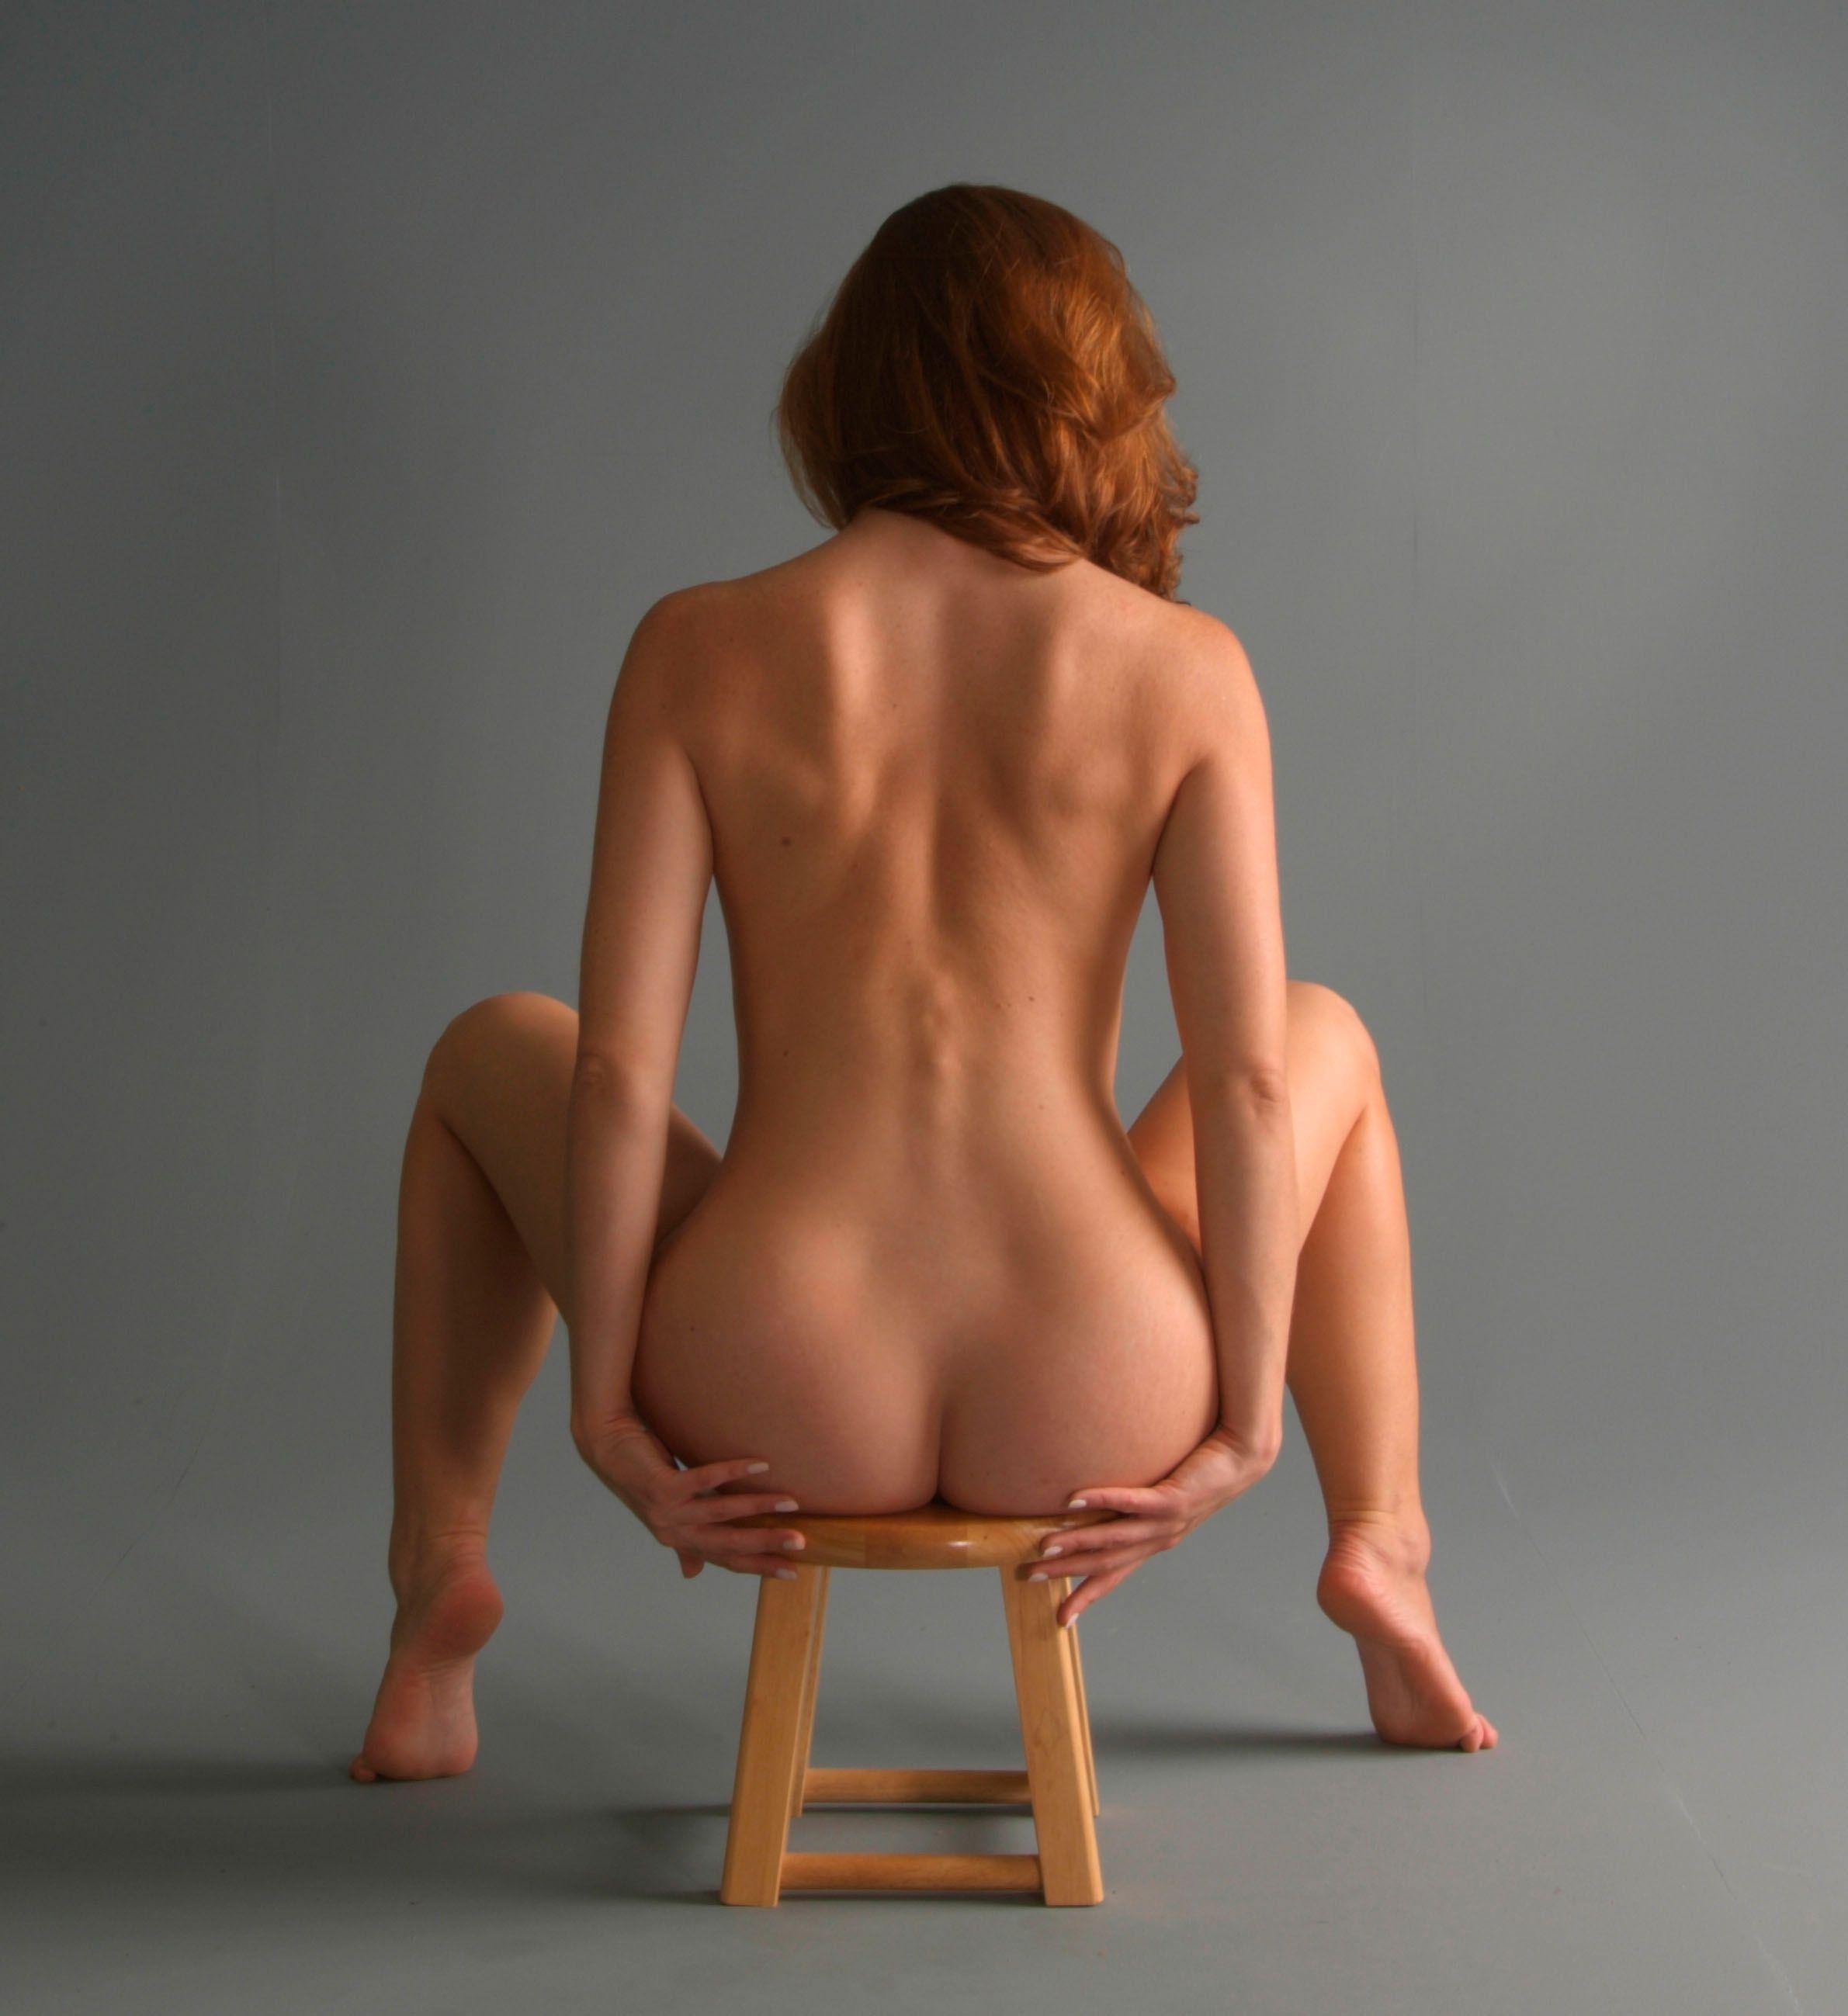 Bodytalk female nude sculpture